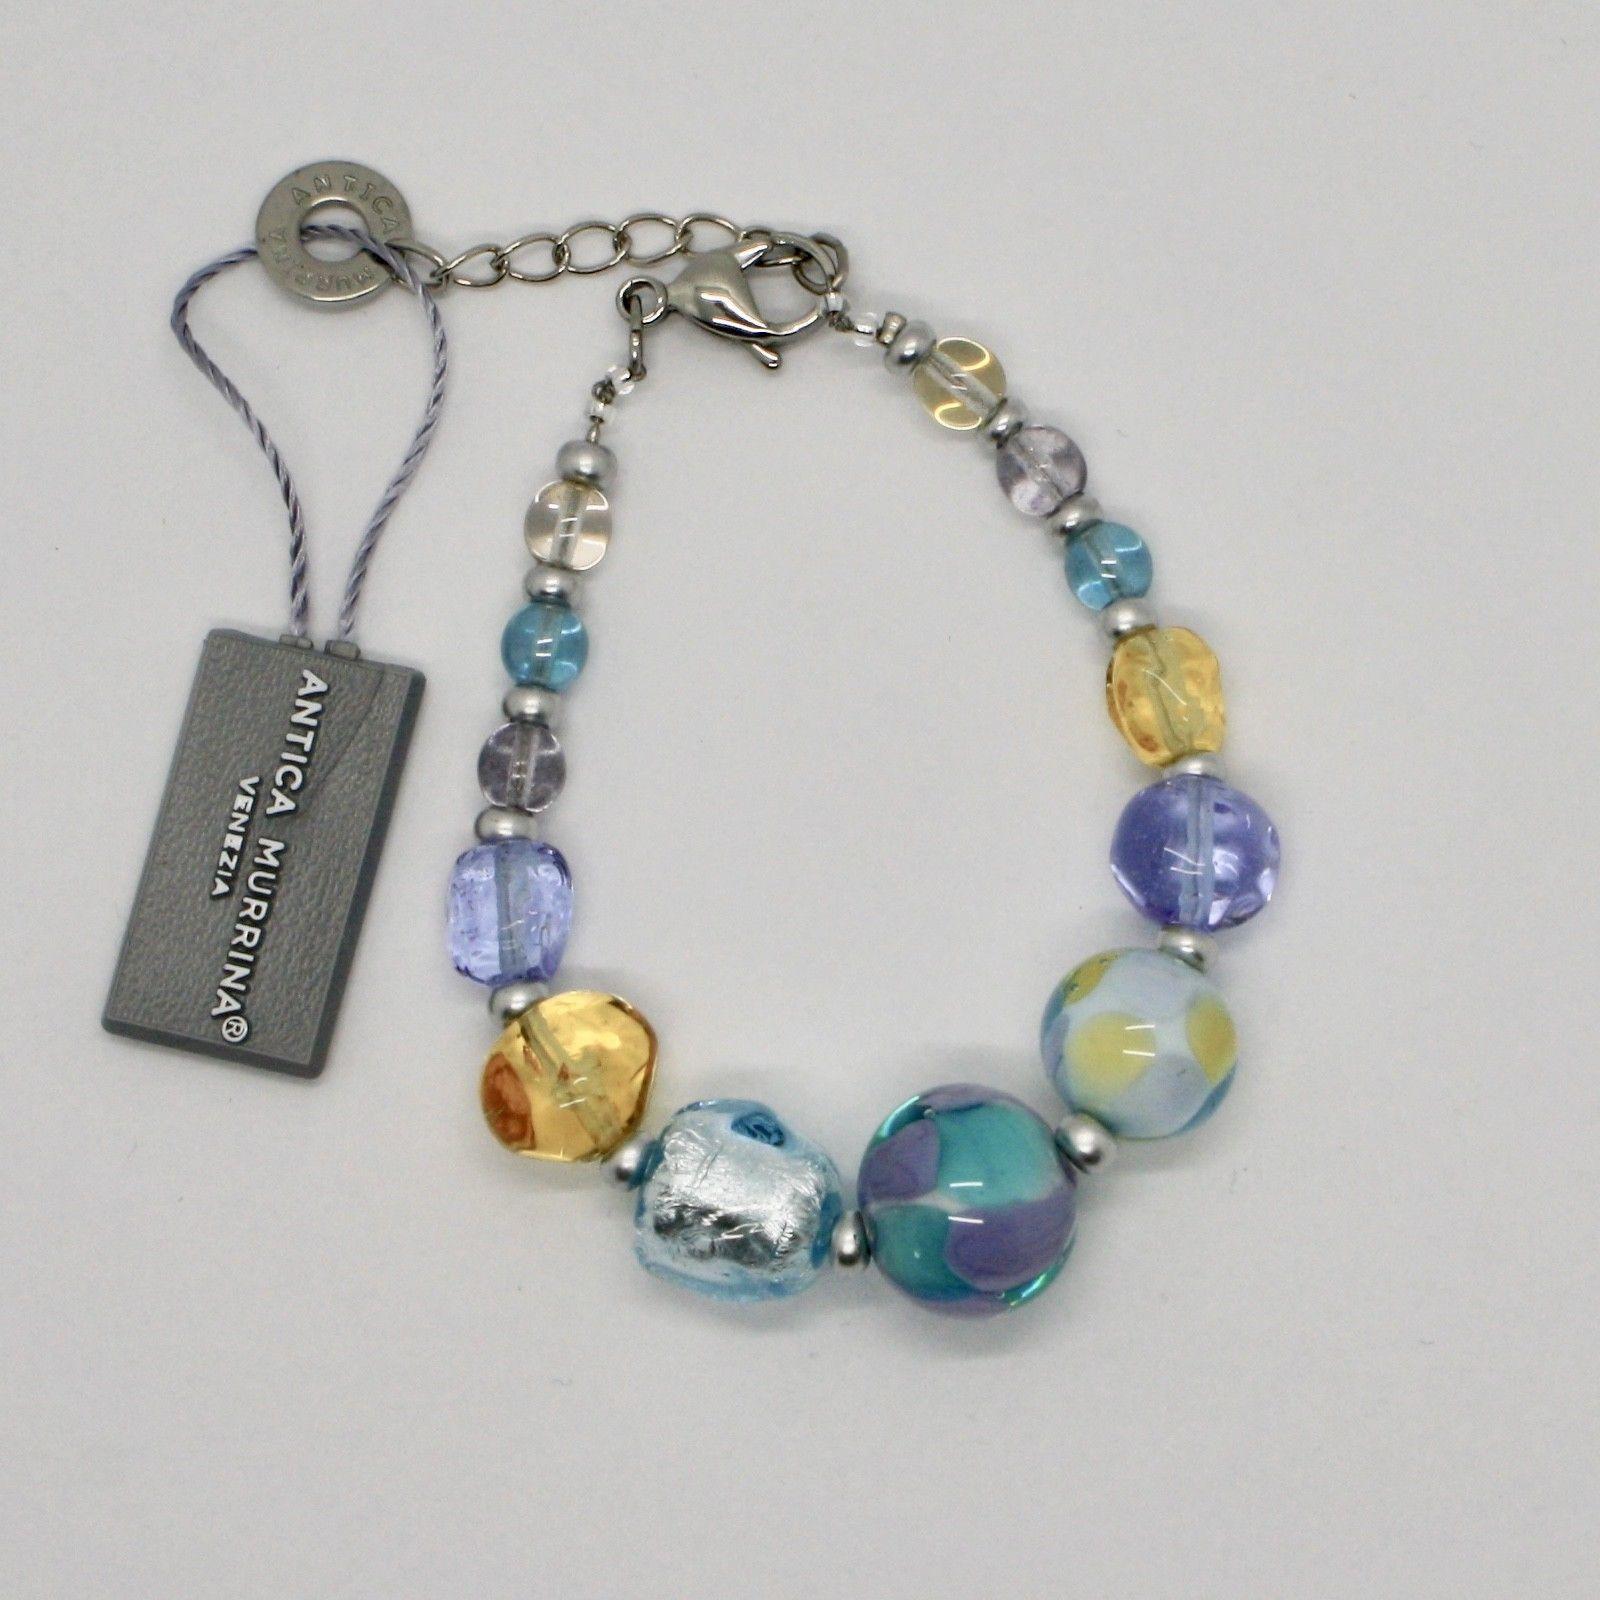 ANTICA MURRINA VENEZIA BRACELET WITH MURANO GLASS BLUE YELLOW BEIGE BR799A07